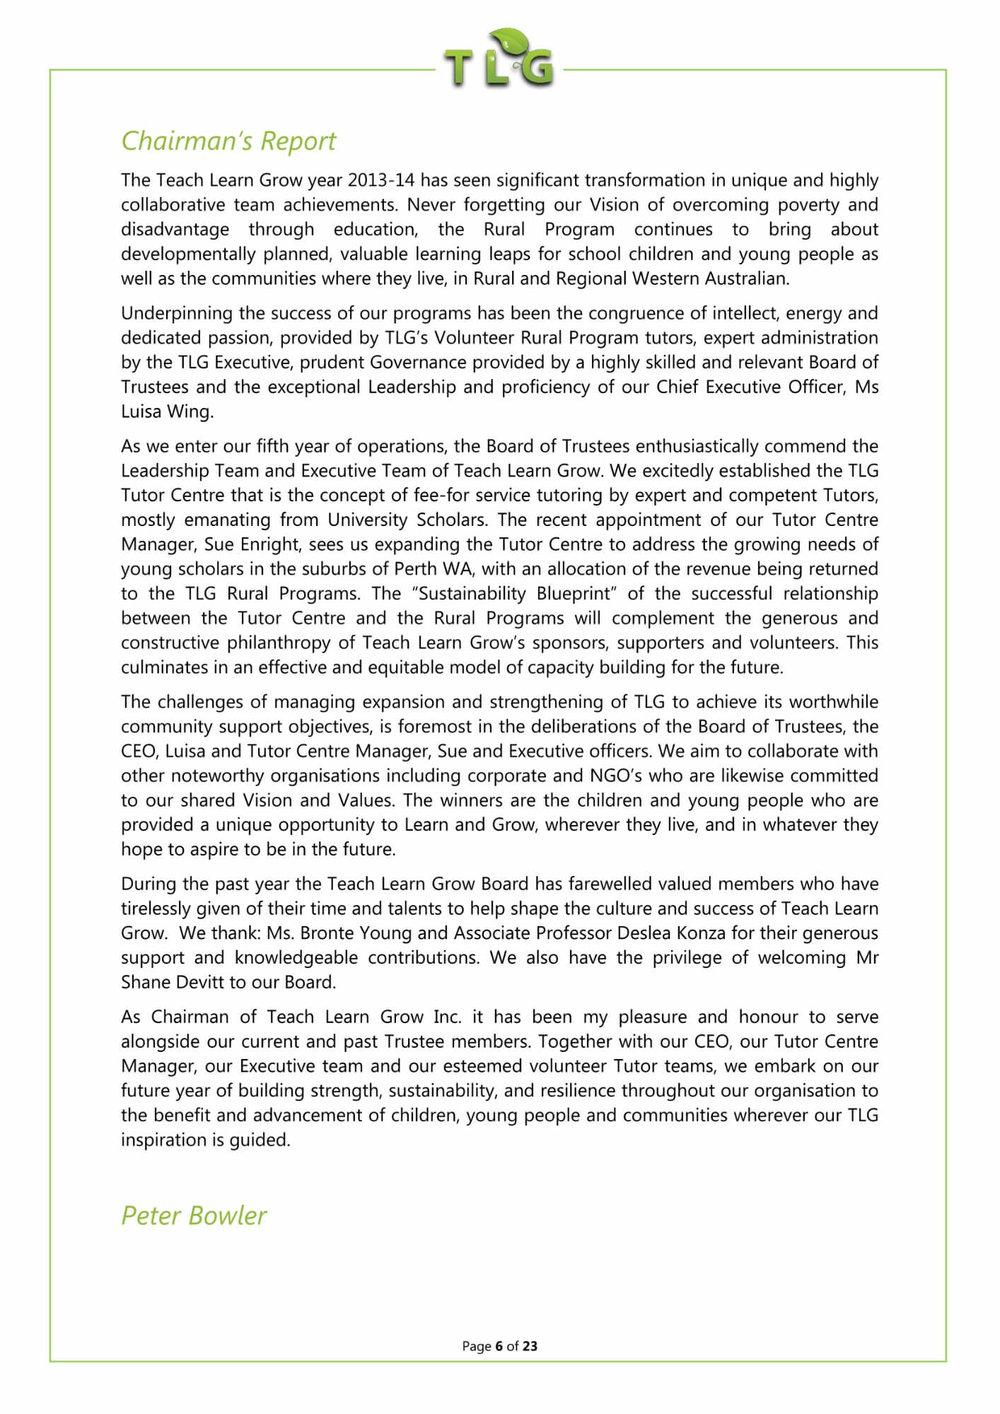 tlg-annual-report-FY13-06.jpg